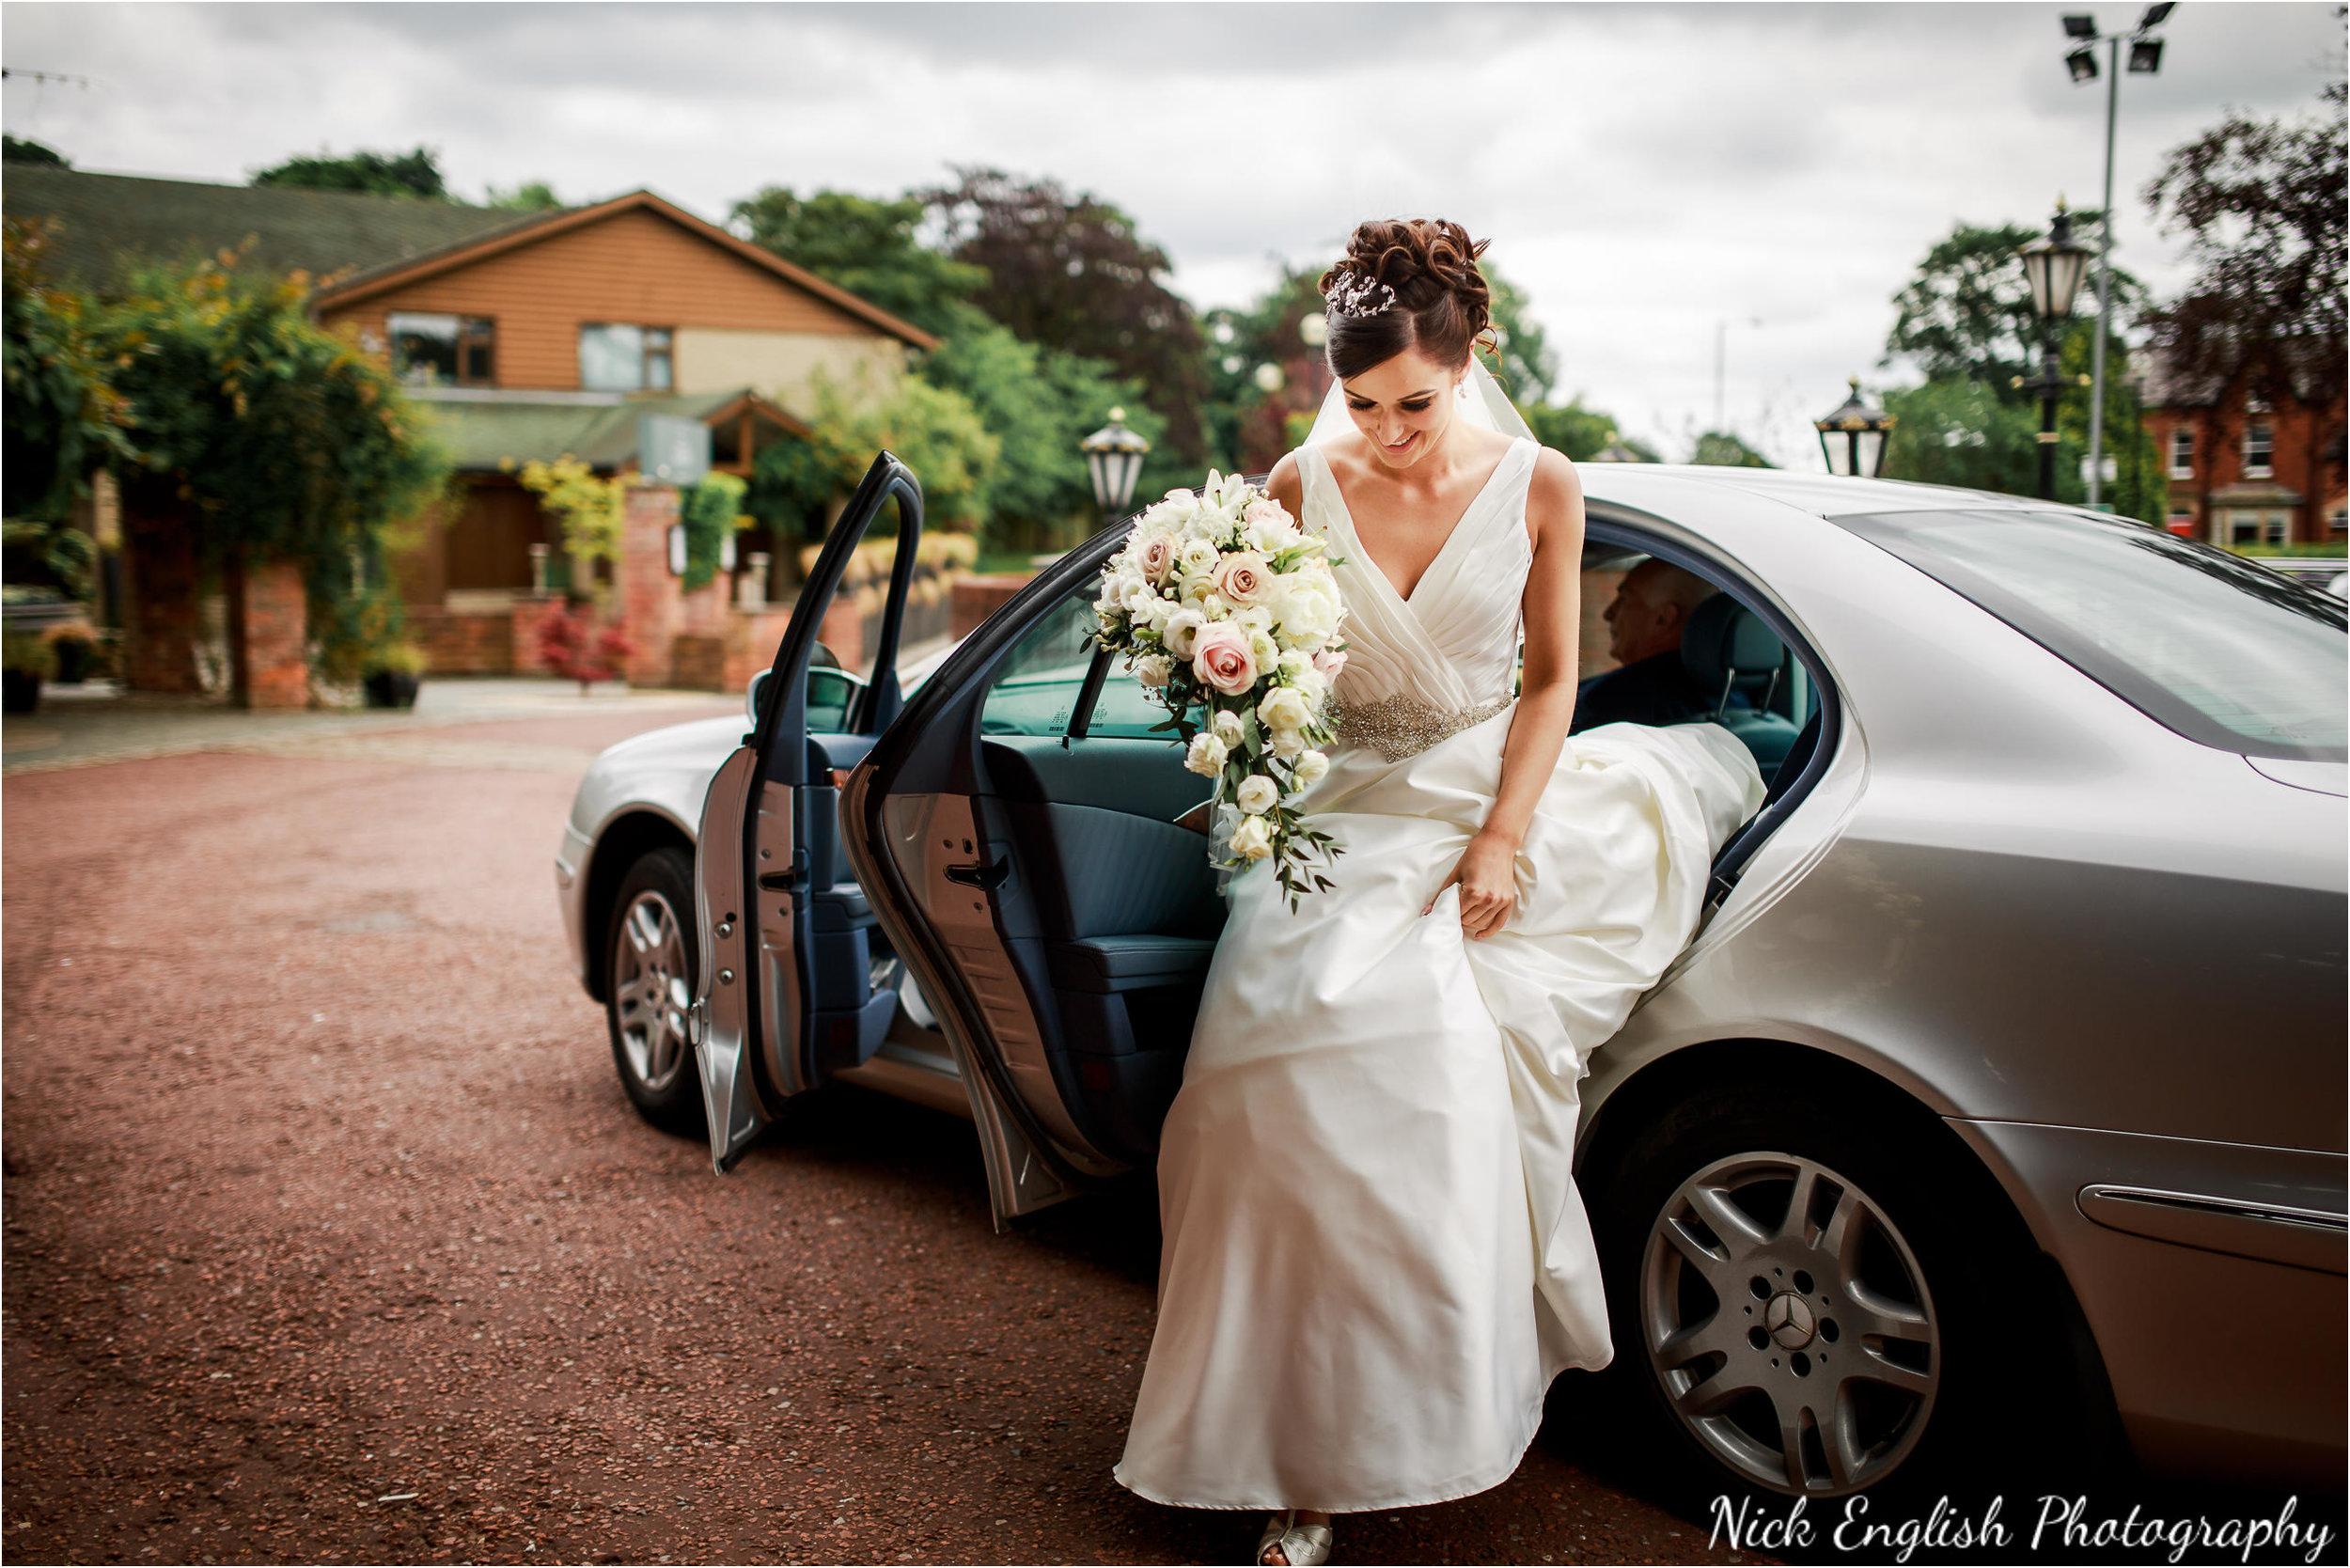 Emily David Wedding Photographs at Barton Grange Preston by Nick English Photography 50jpg.jpeg